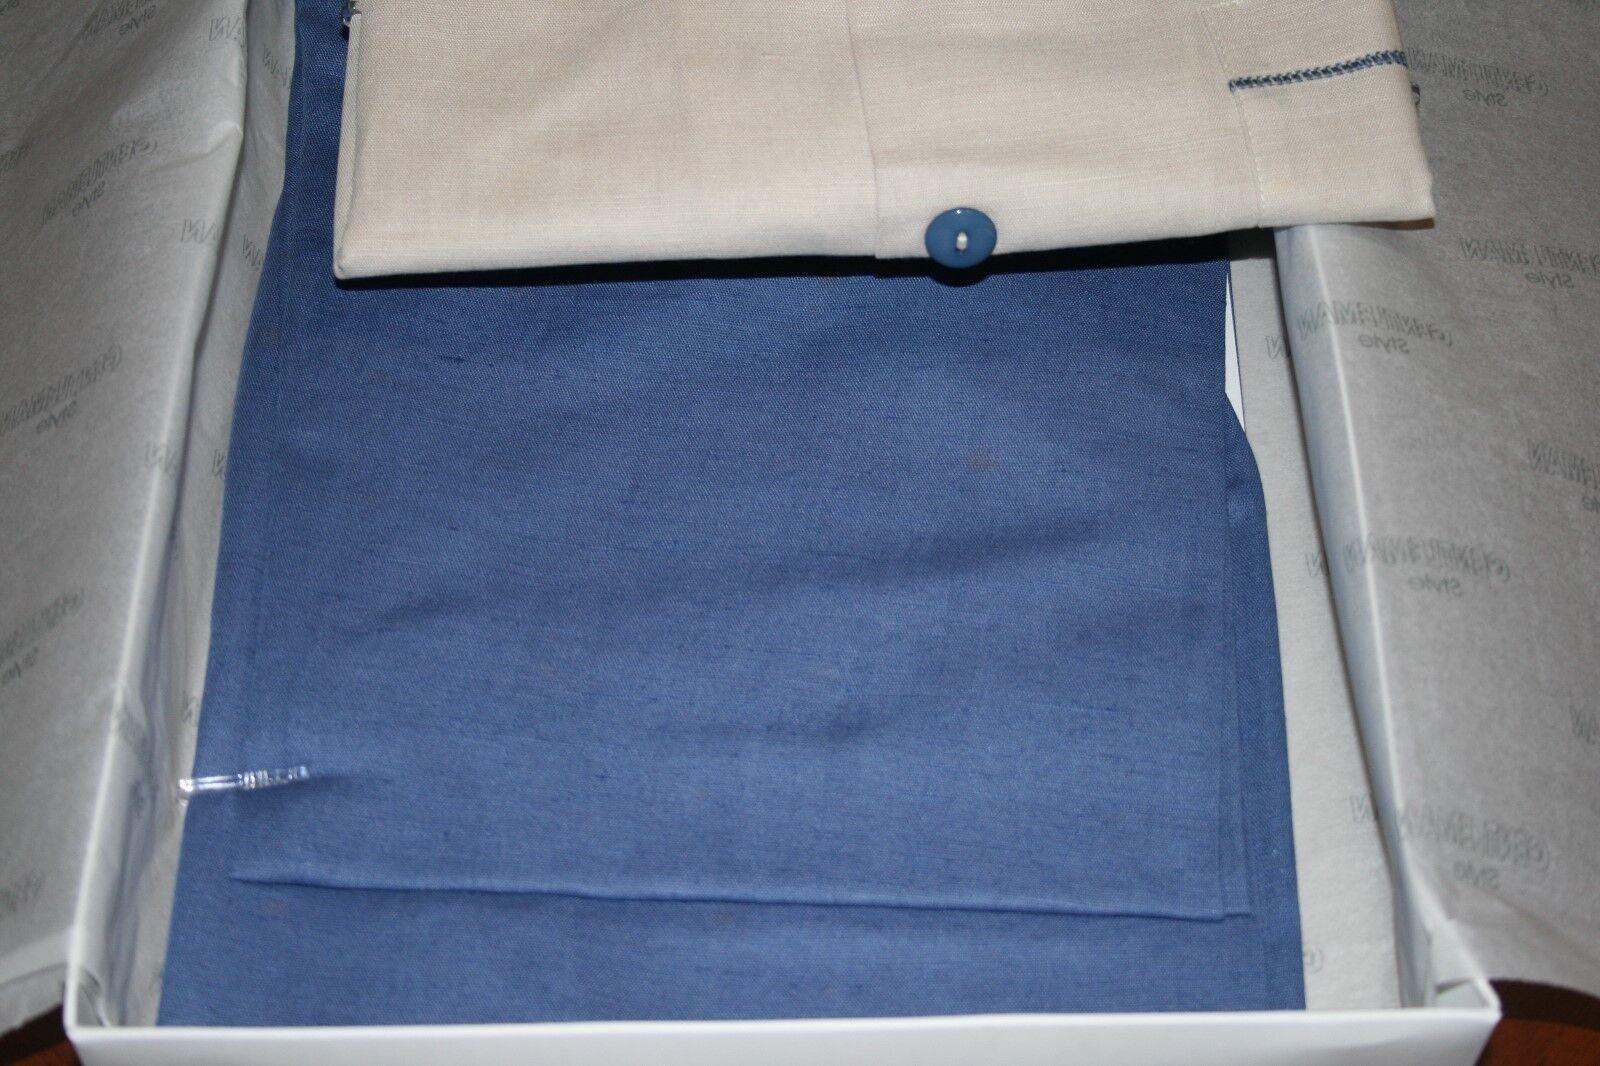 Espionage in maglia colorato a quadri quadri a set pigiama (063) Taglie 2XL to 8xl 1409af